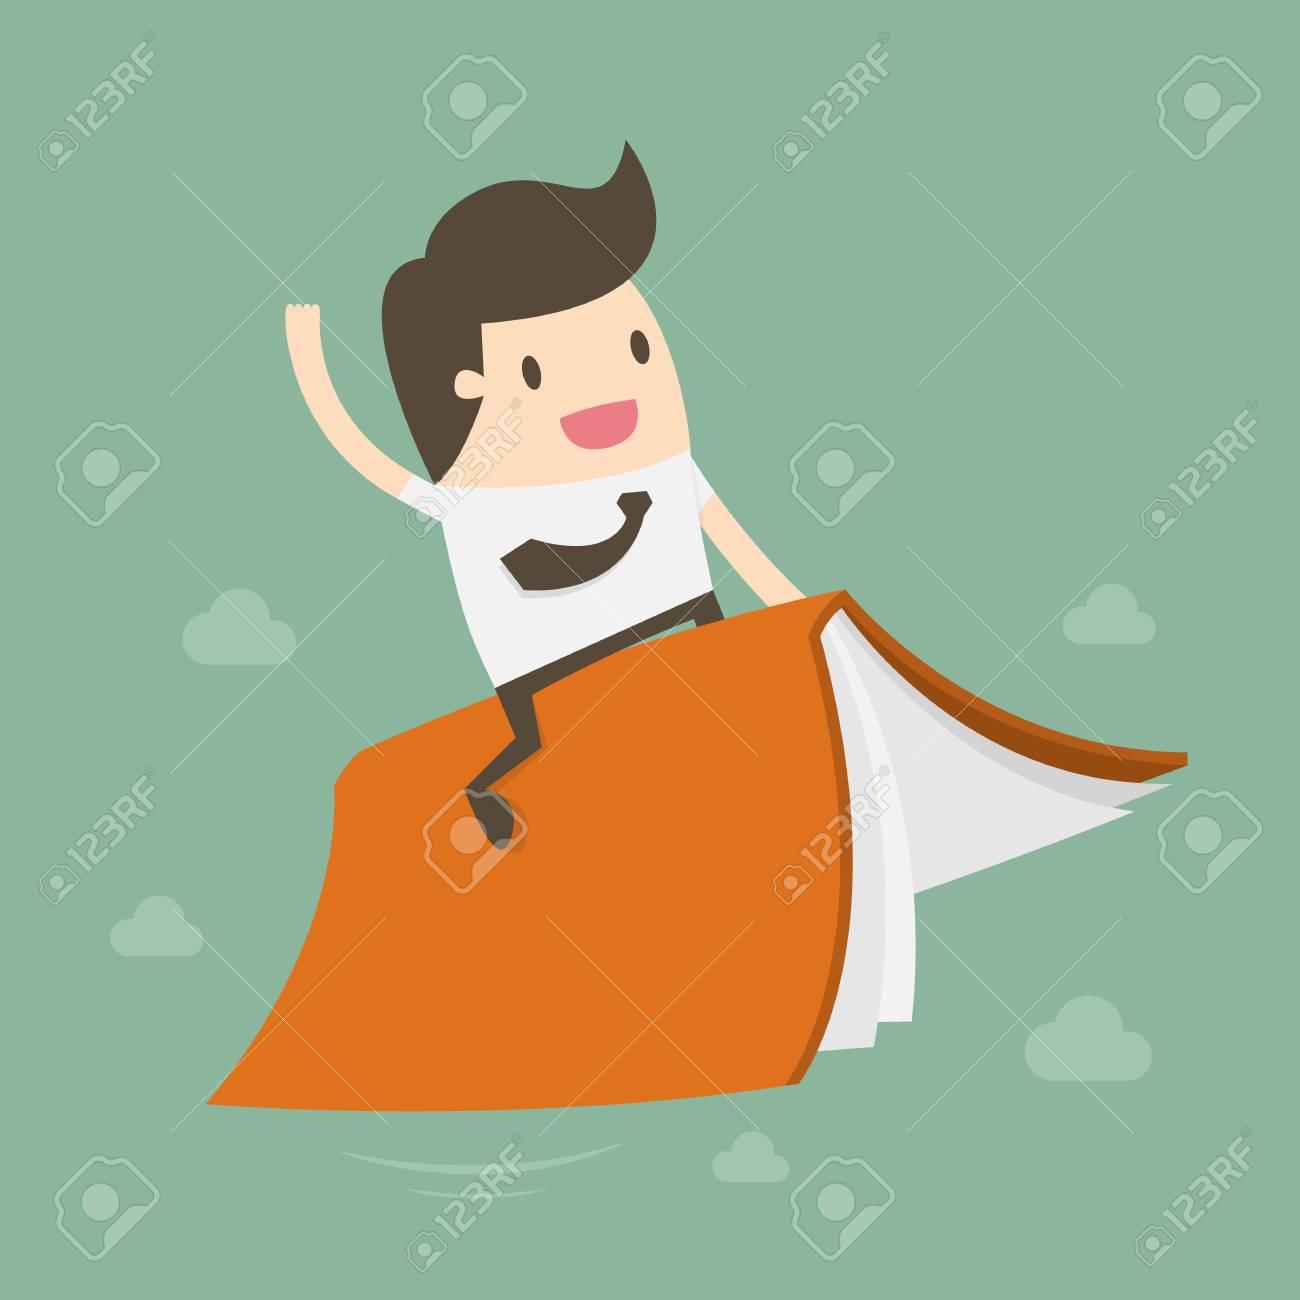 Businessman Riding Flying Book, flat cartoon design - 96402096